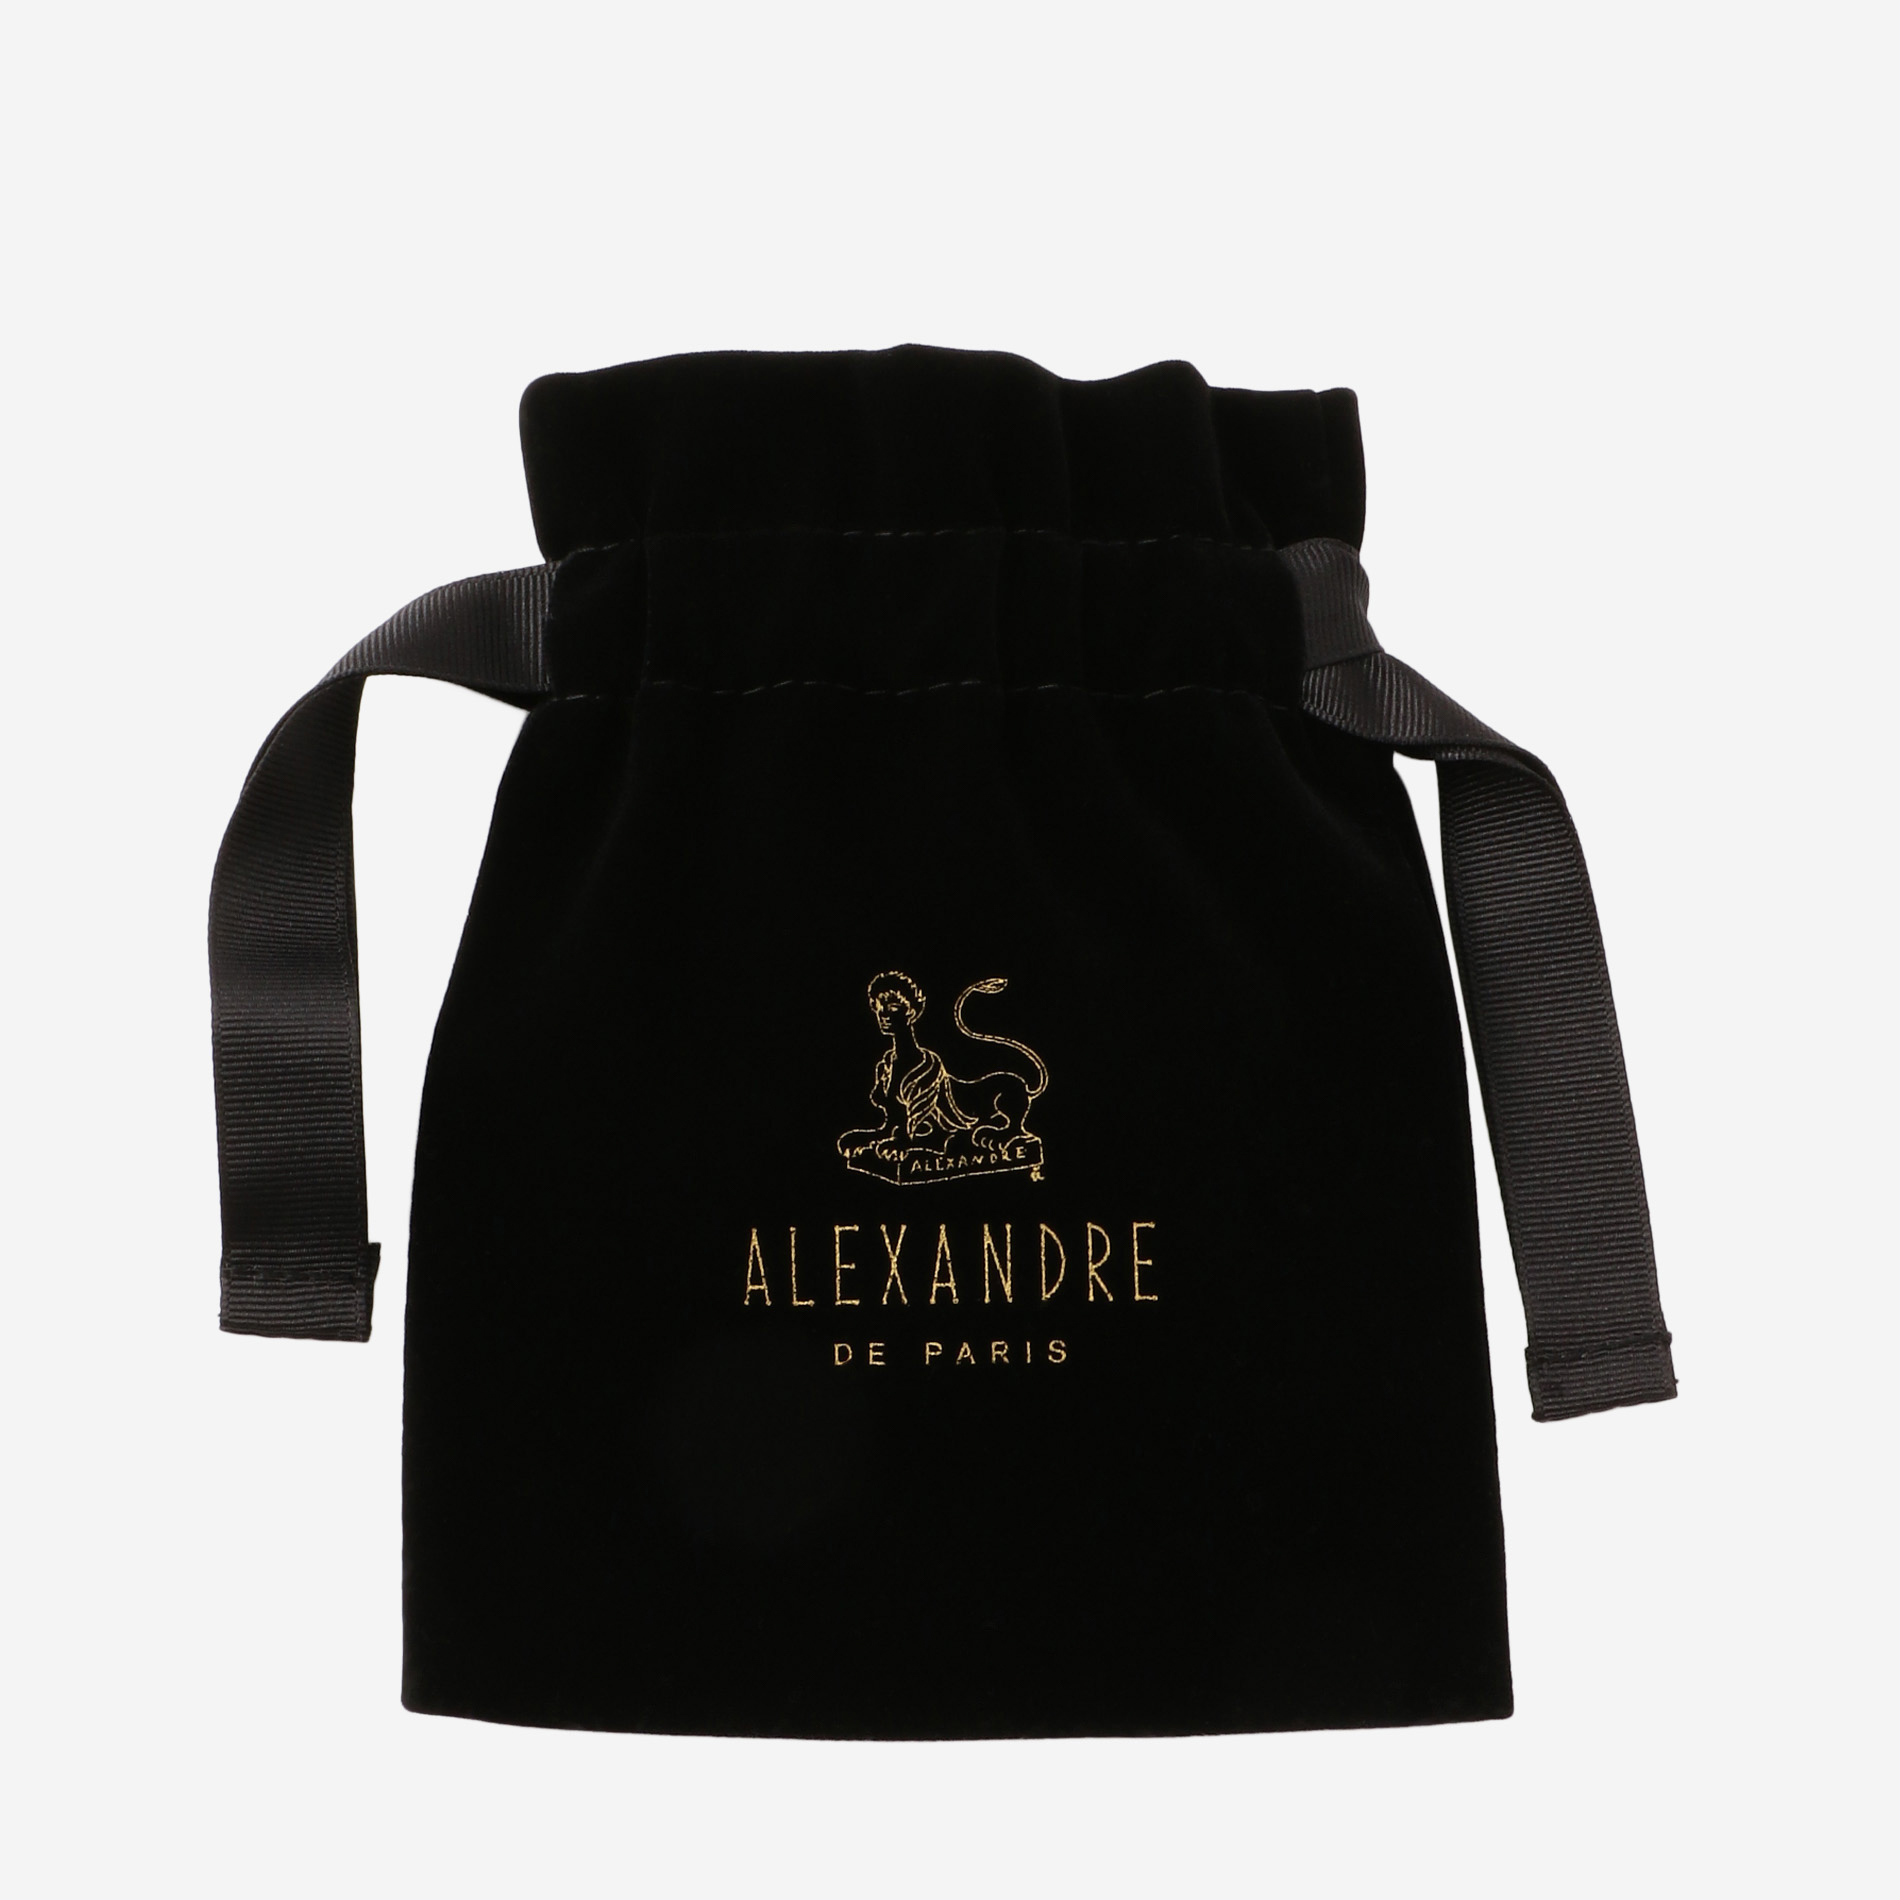 【ALEXANDRE DE PARIS】アーチバレッタ